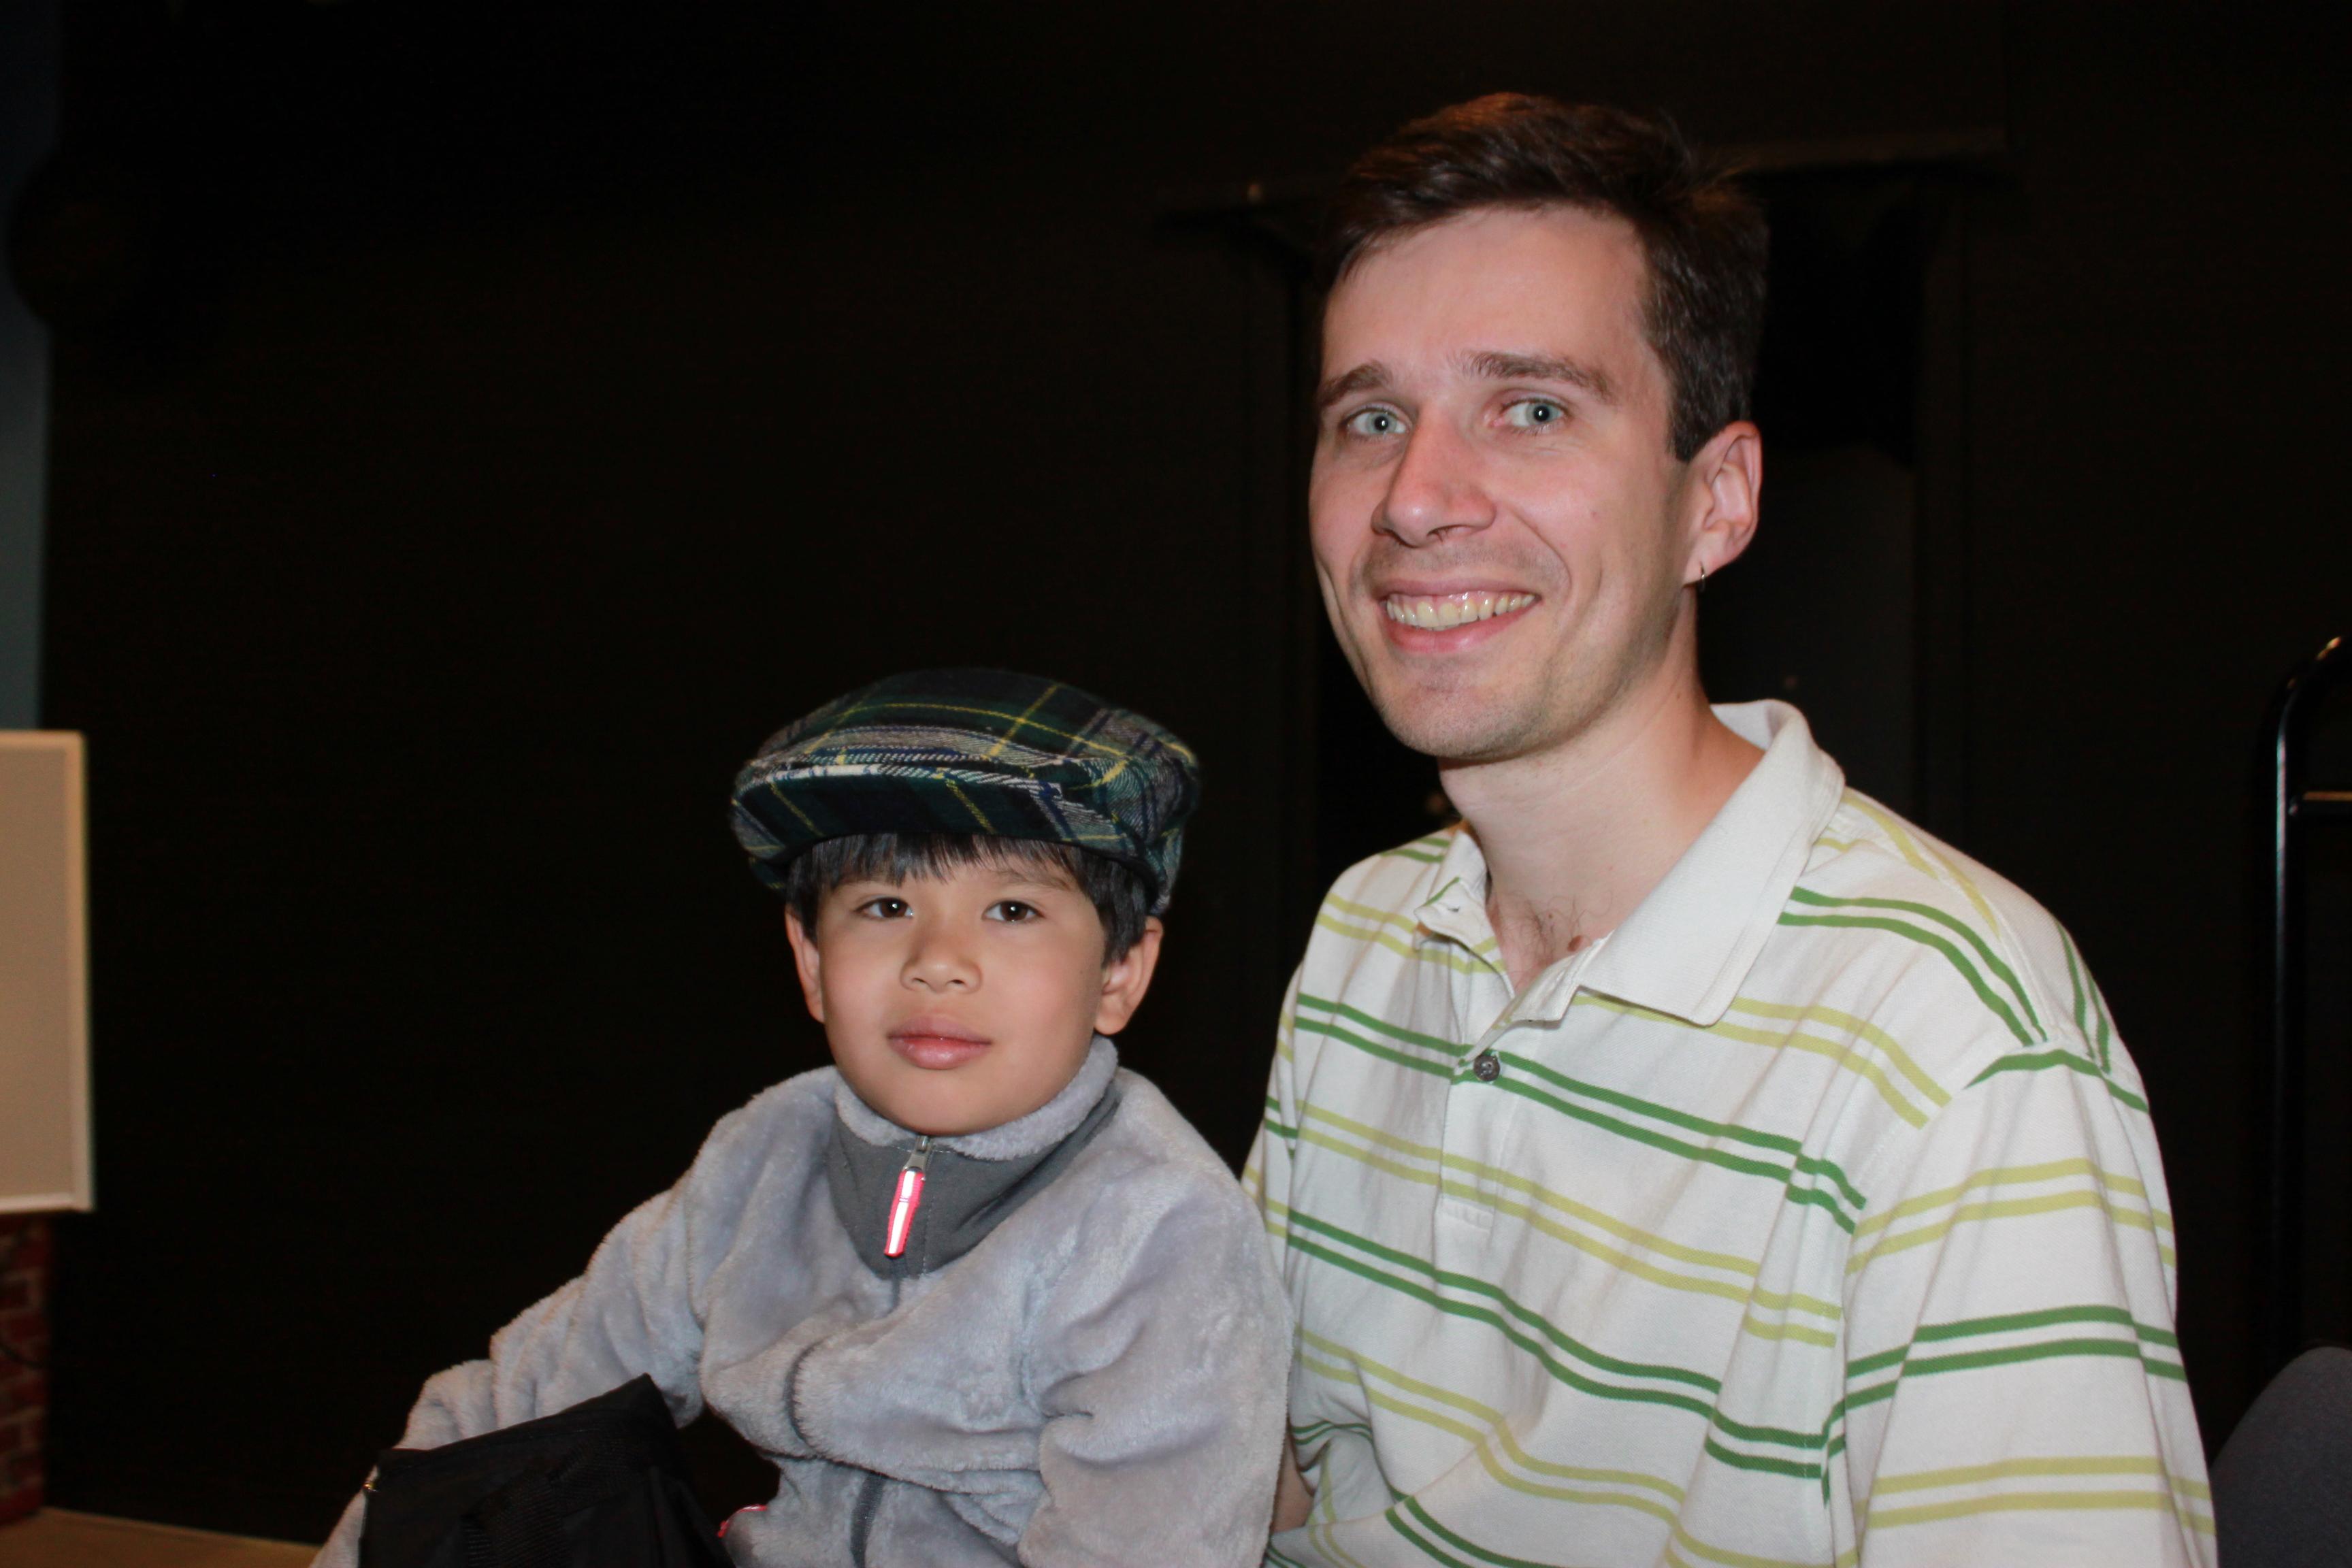 Joe Nabholz with son William